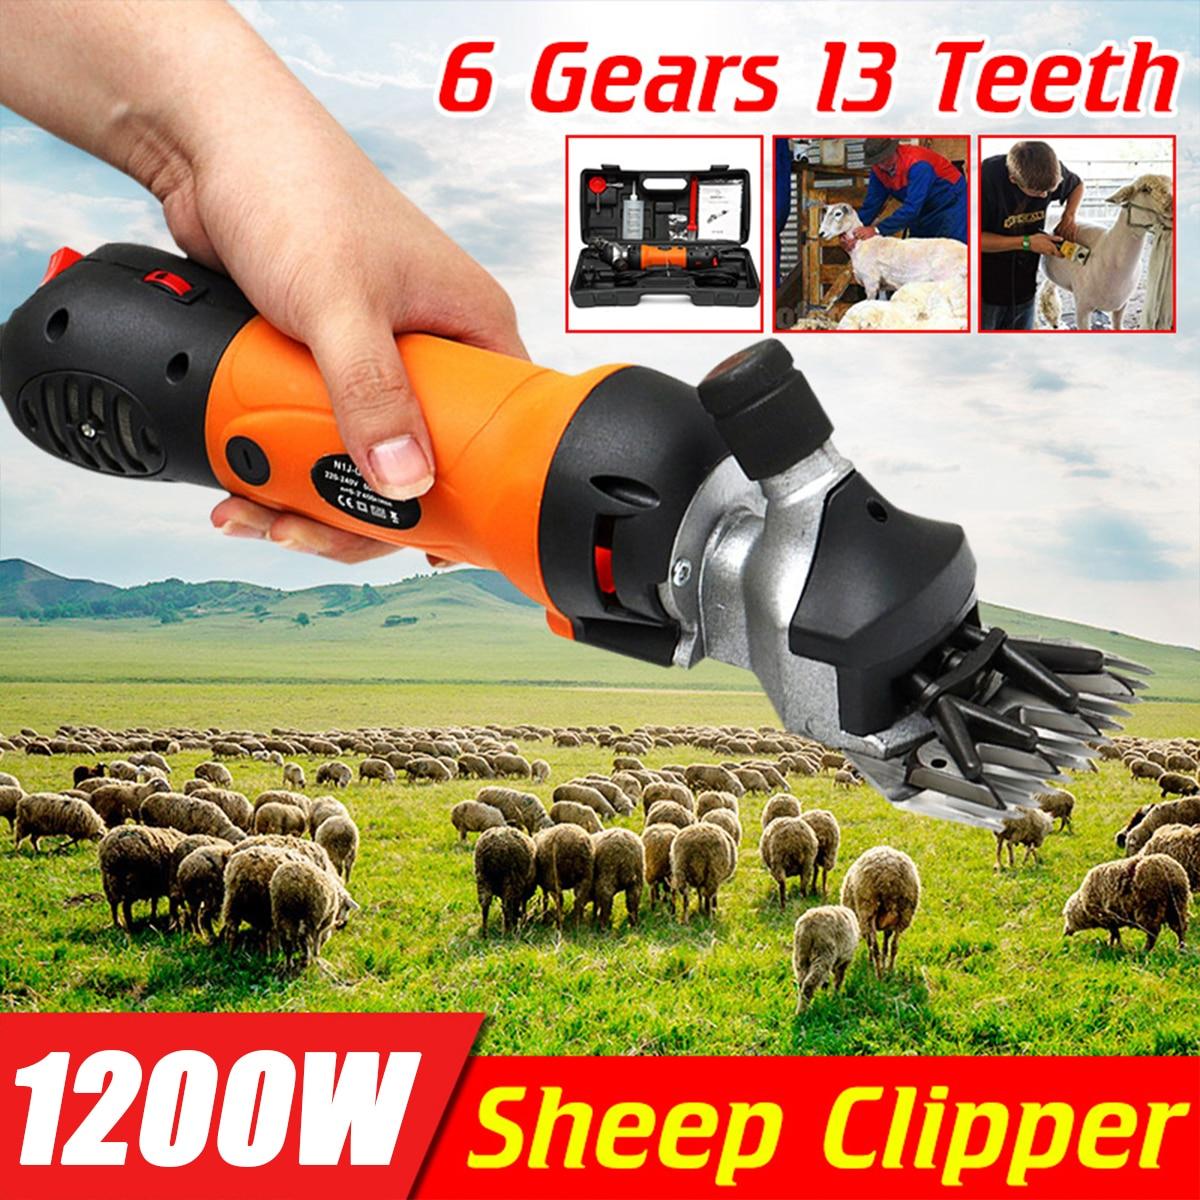 1200W 110V220V Electric Sheep Pet Hair Clipper Shearing Kit Wool Cut Goat Horse Animal Shearing Supplies Farm Scissor